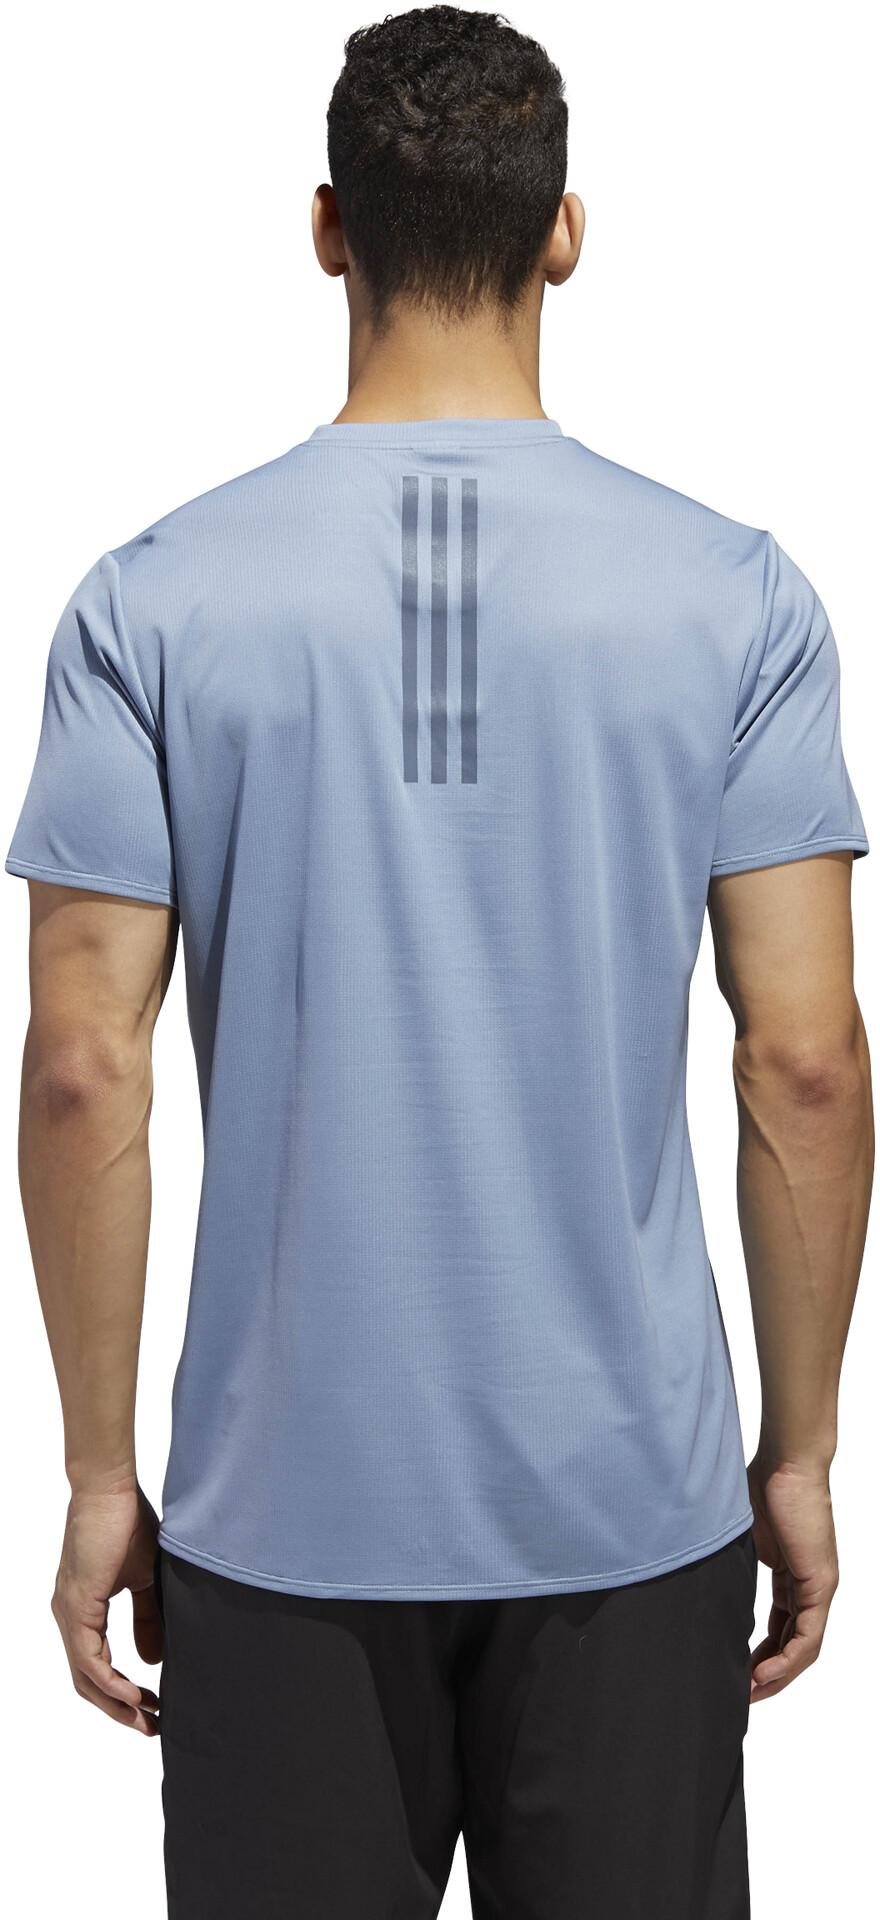 86b92ec4990 adidas Supernova Løbe T-shirt Herrer, raw grey